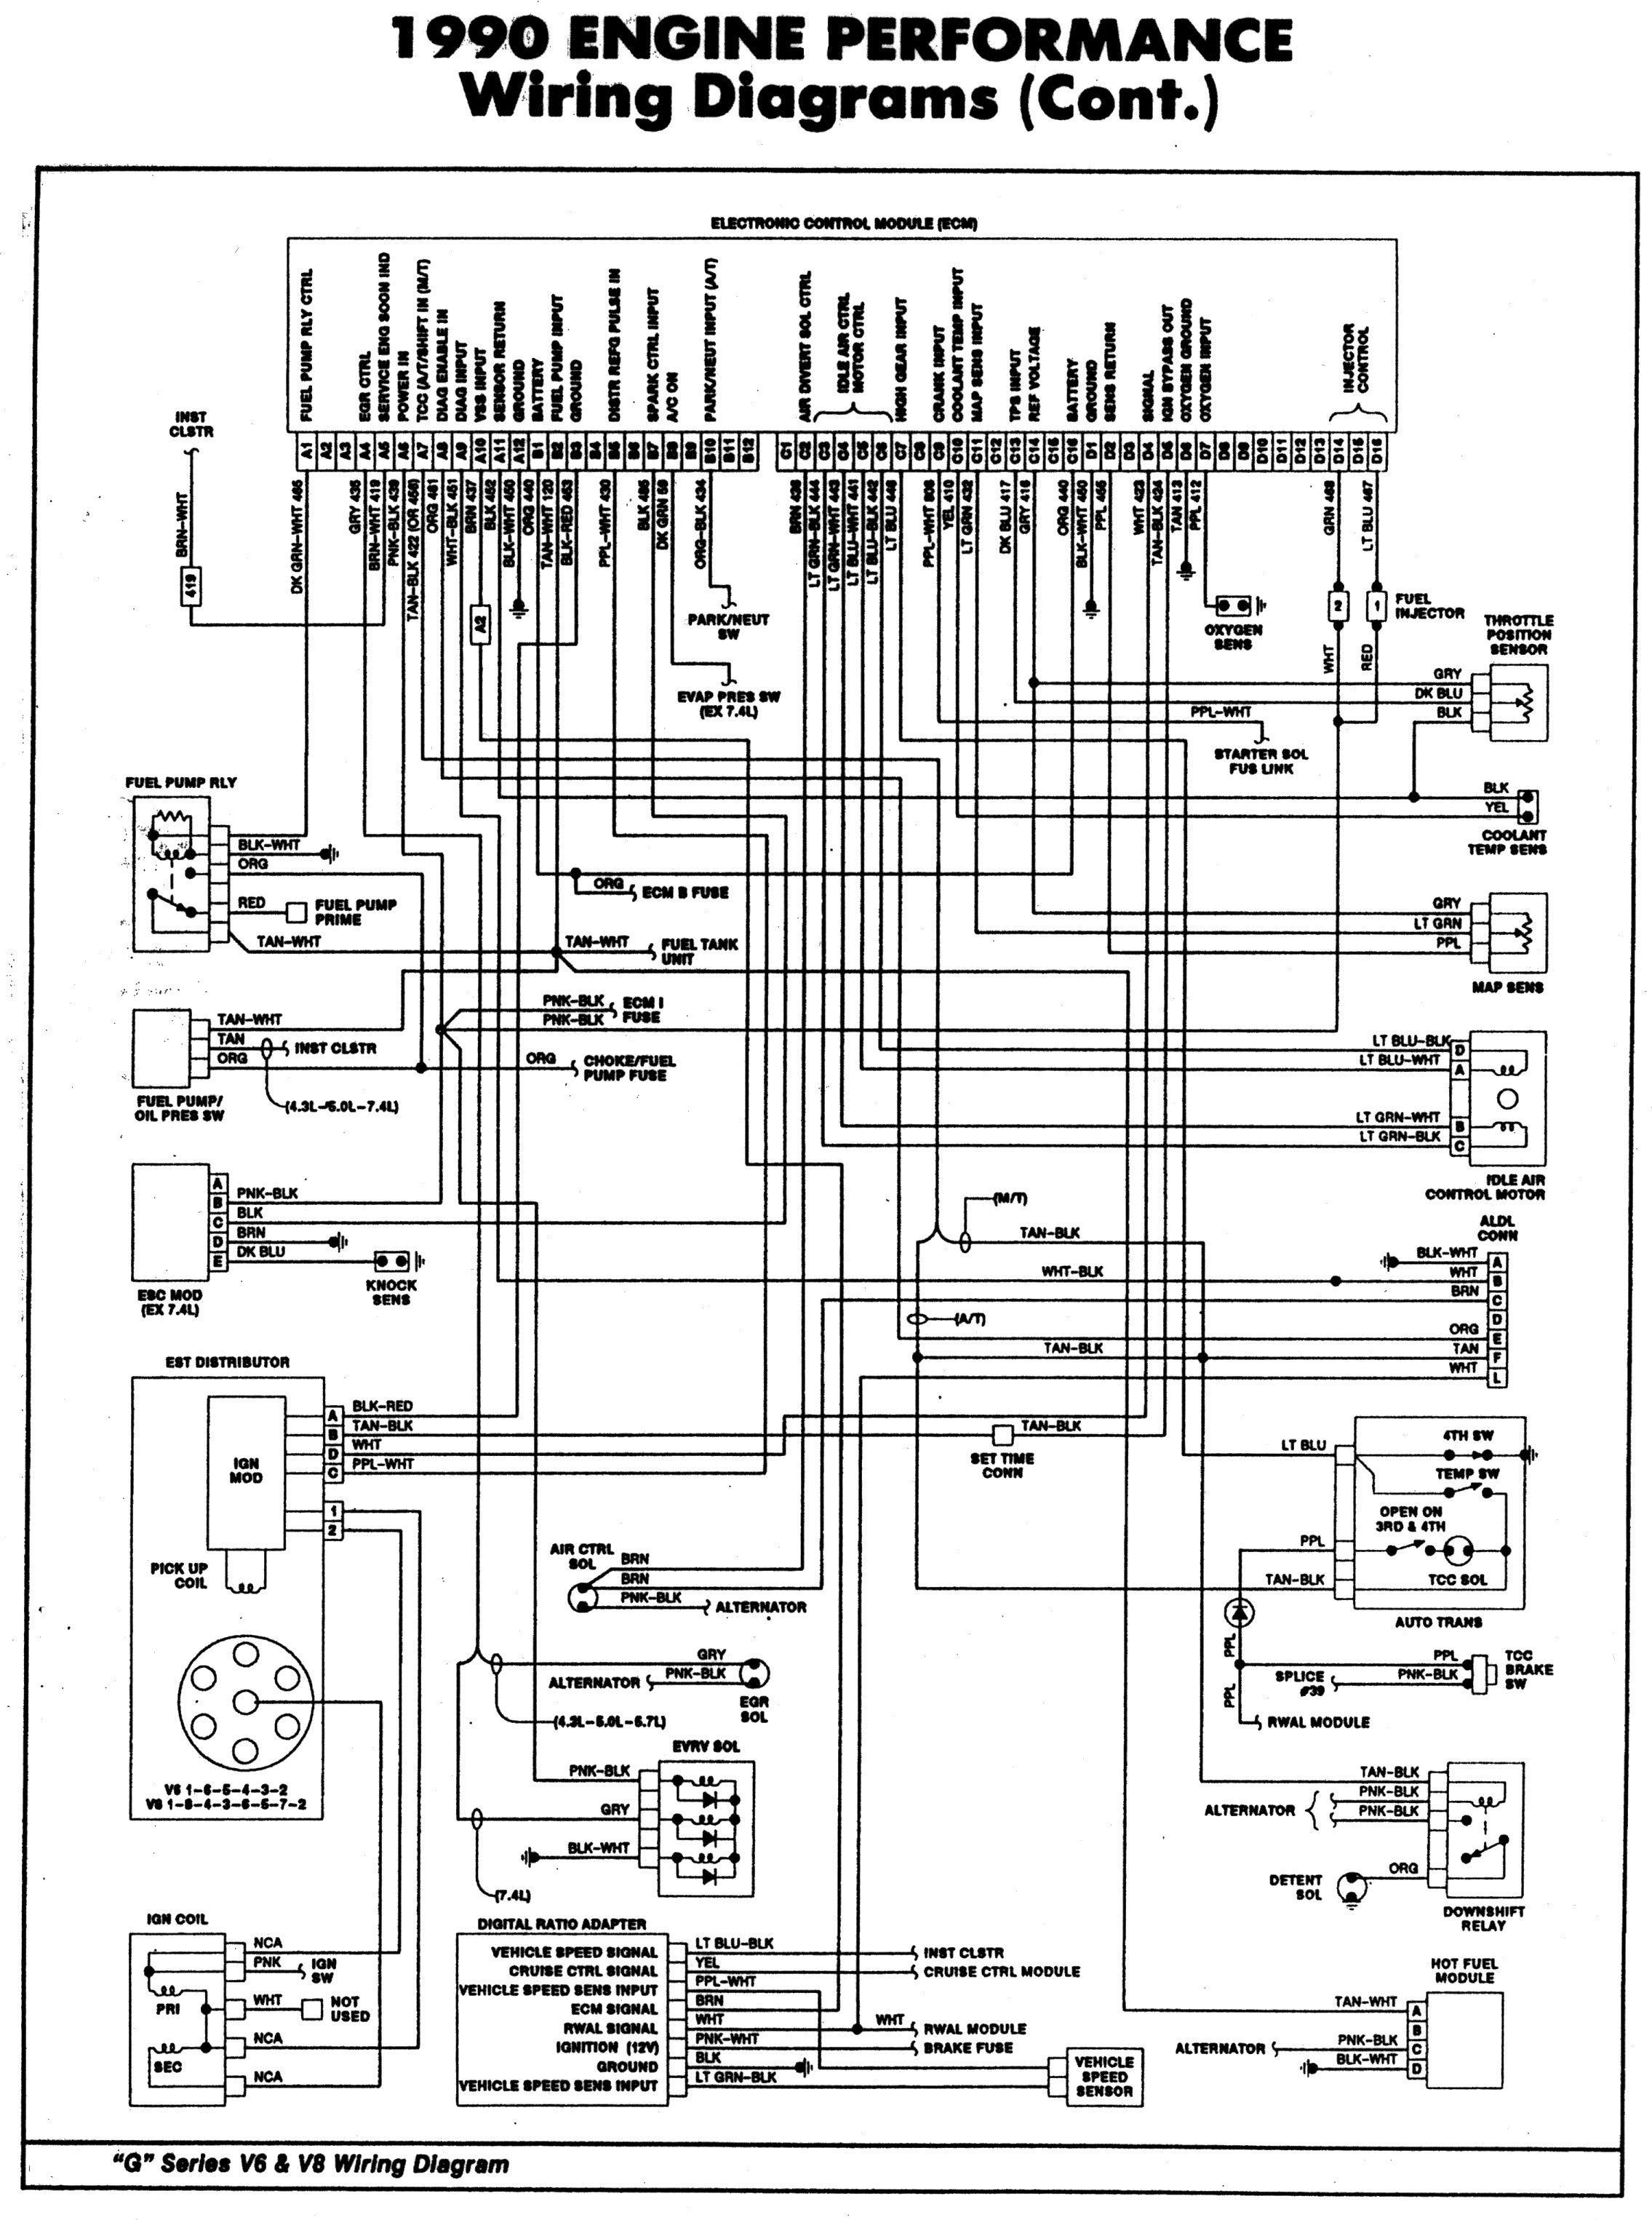 1994 Chevrolet 1500 Ignition Wiring Diagram | WIRING DIAGRAM